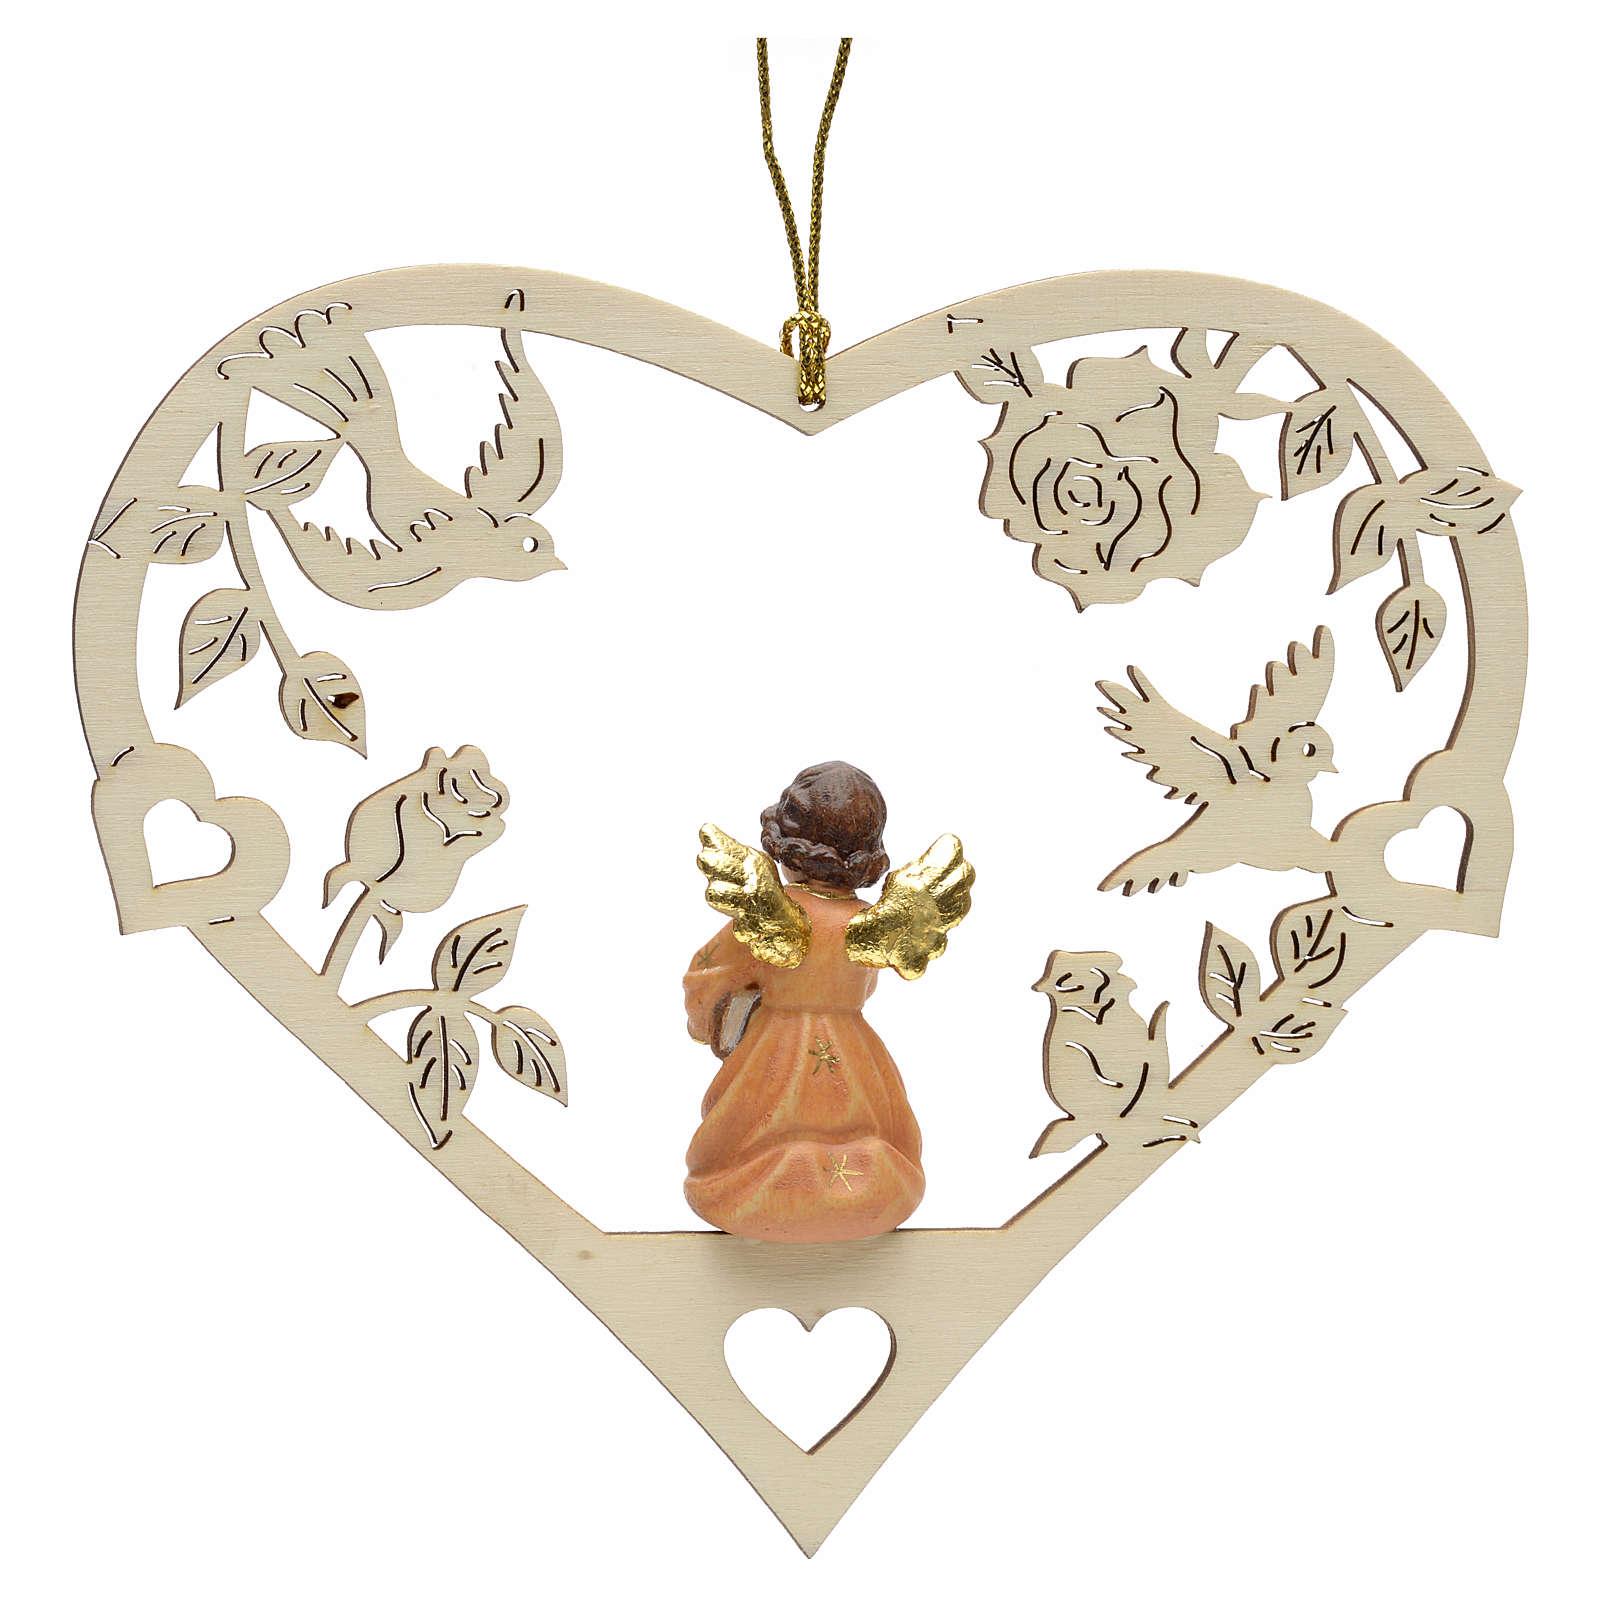 Christmas decor angel with book on heart 4